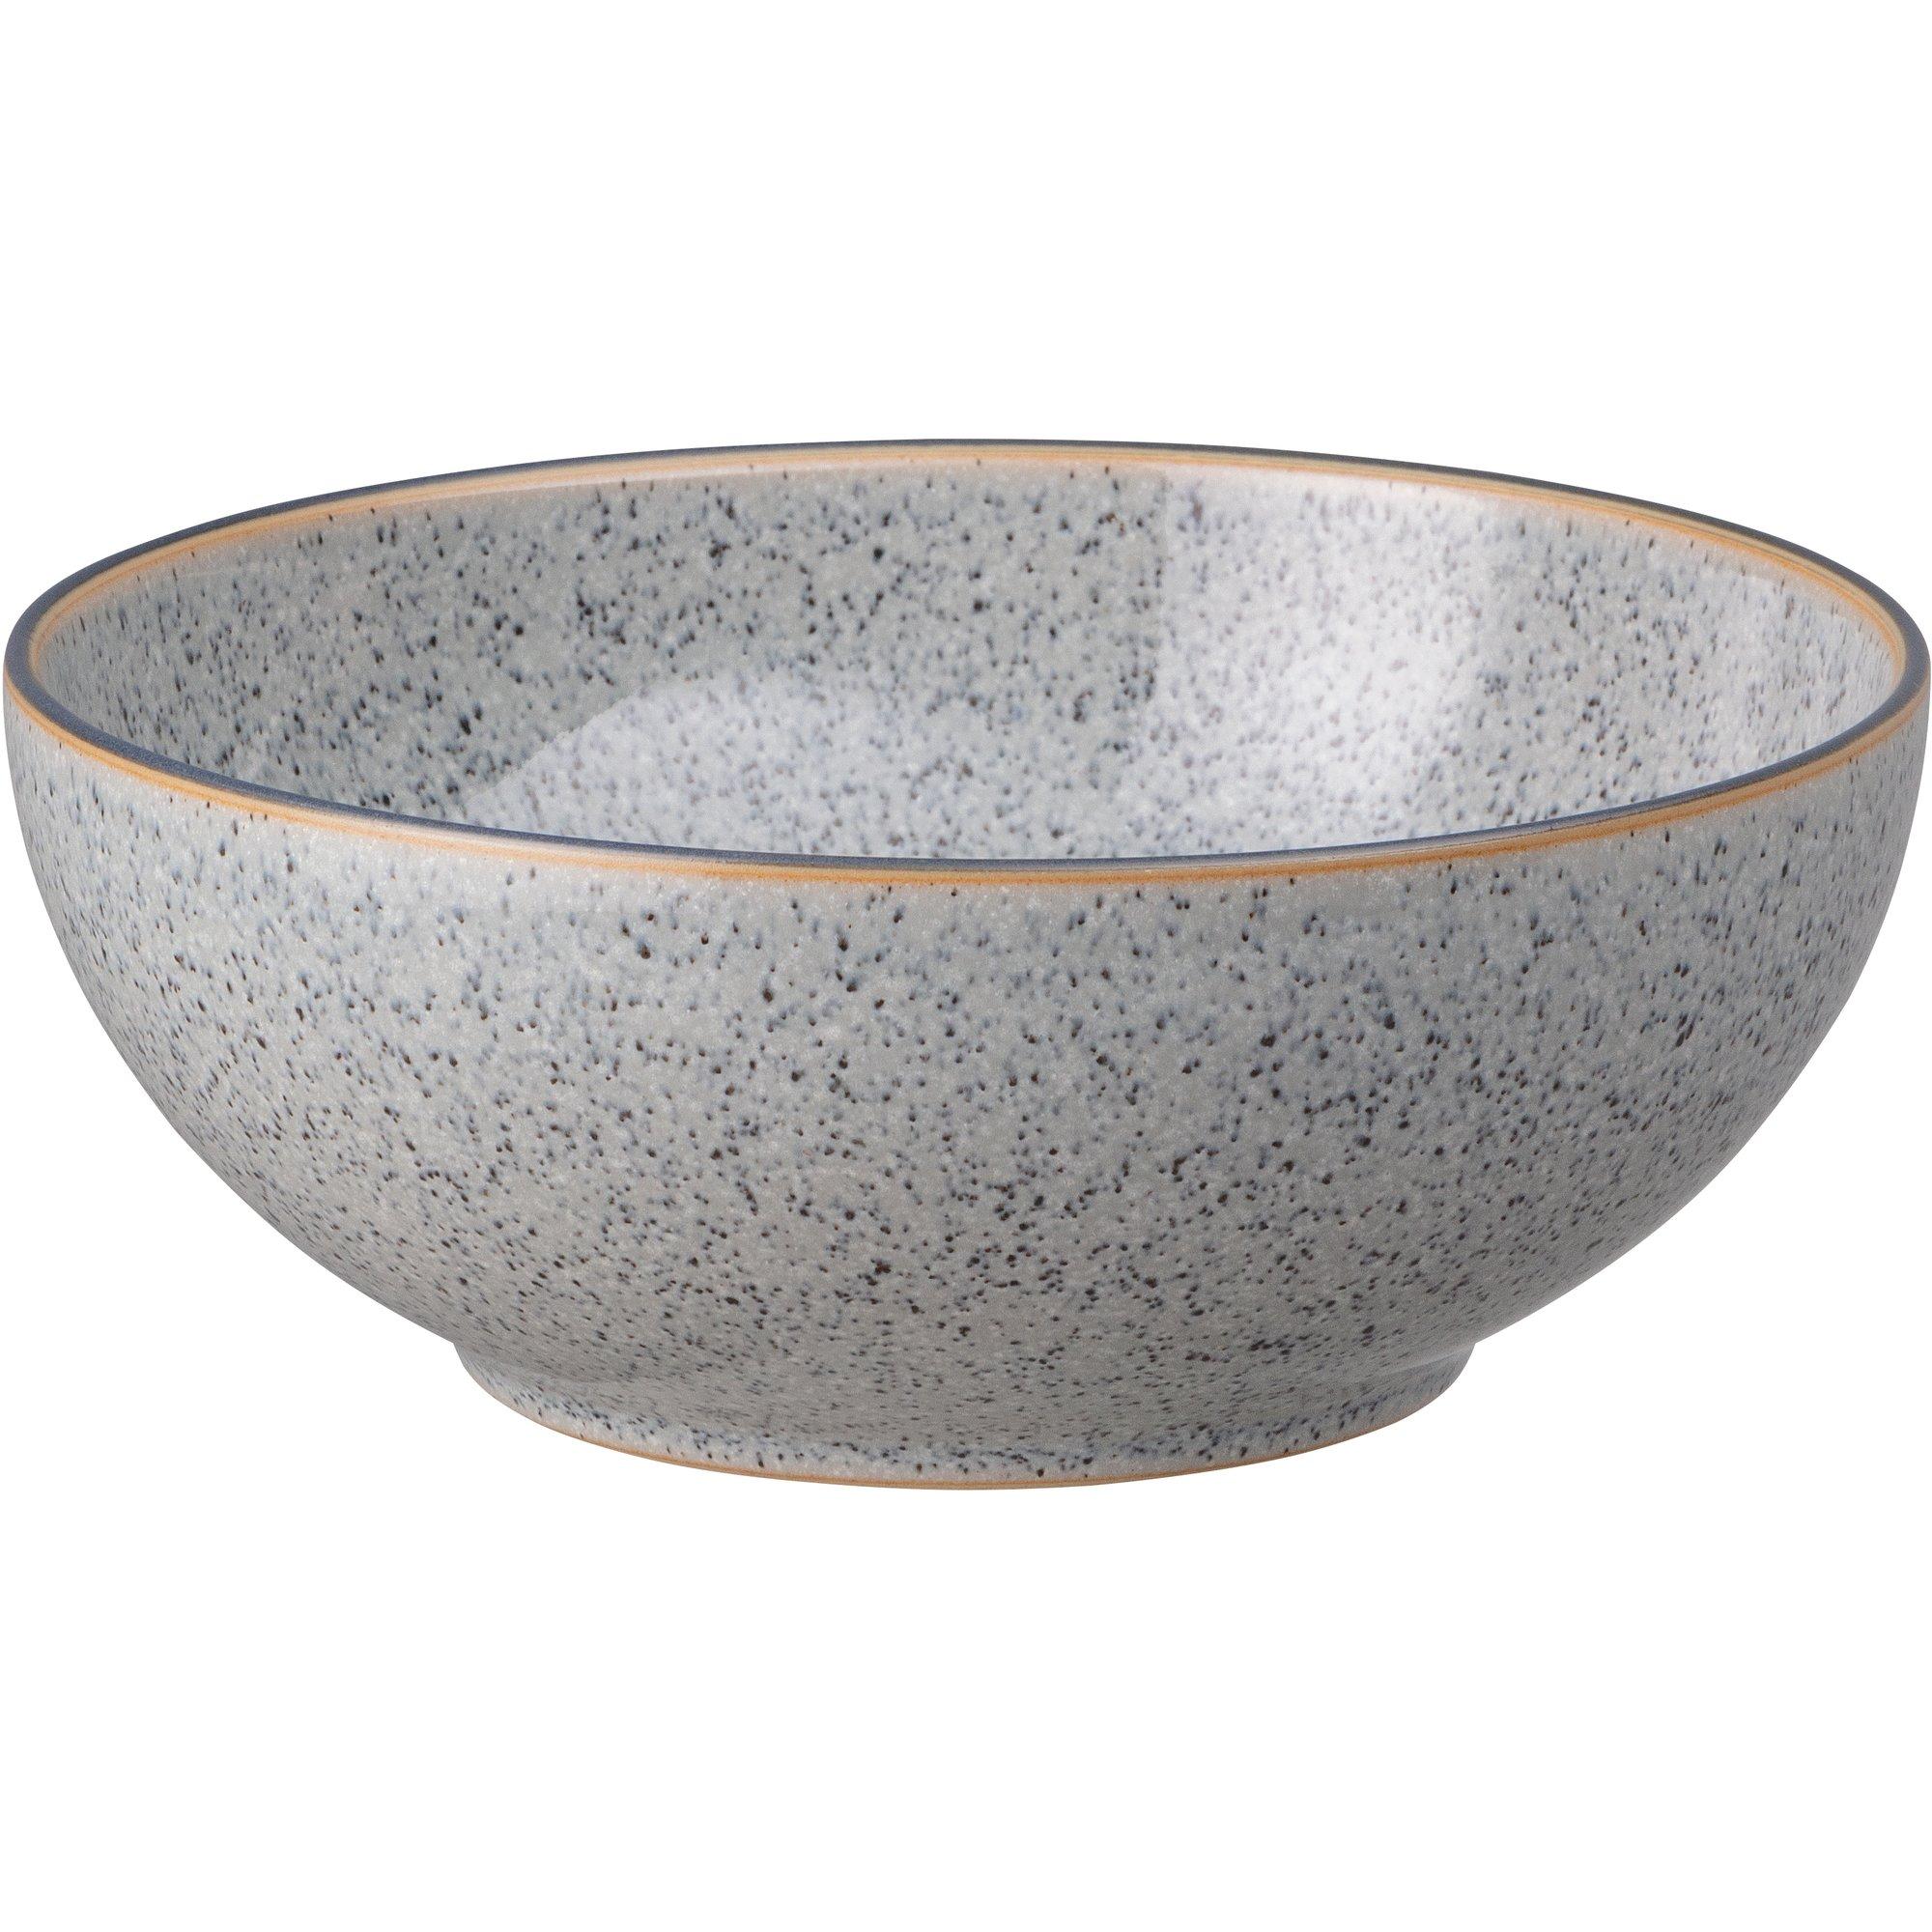 Denby Studio Grey Skål 17 cm